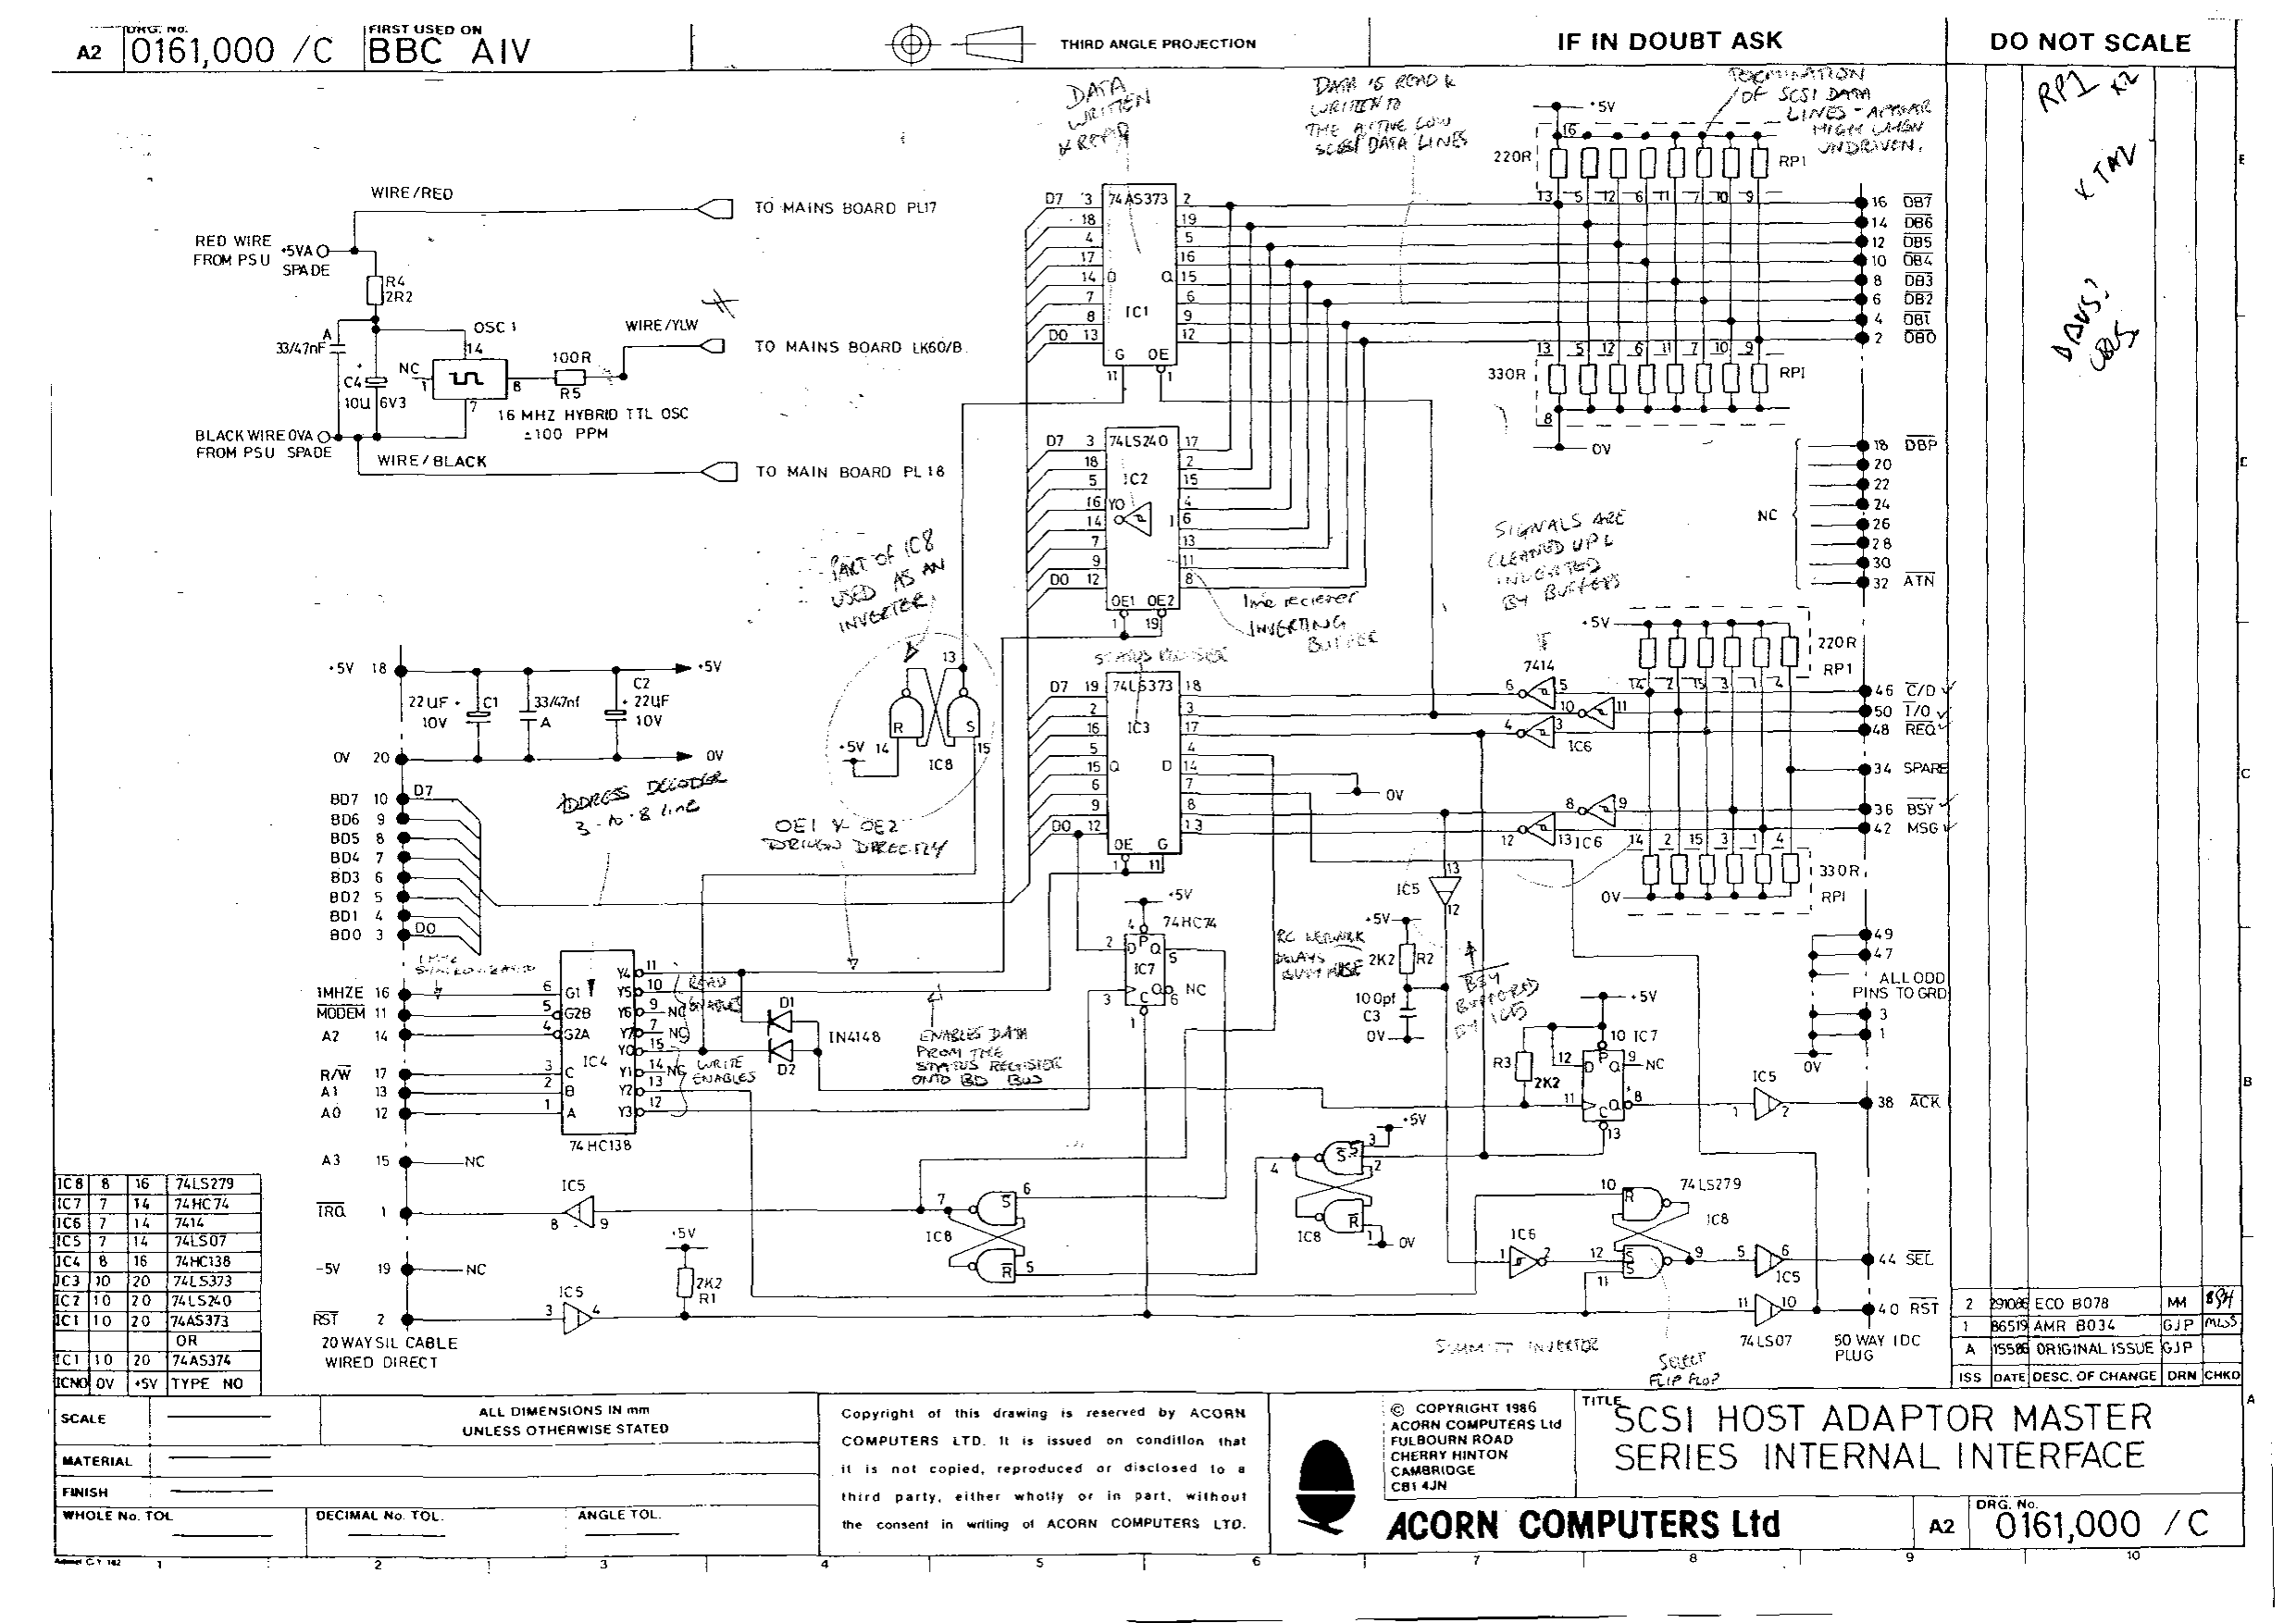 Acorn Aiv Scsi Host Adapter Genlock Wiring Diagram Schematic